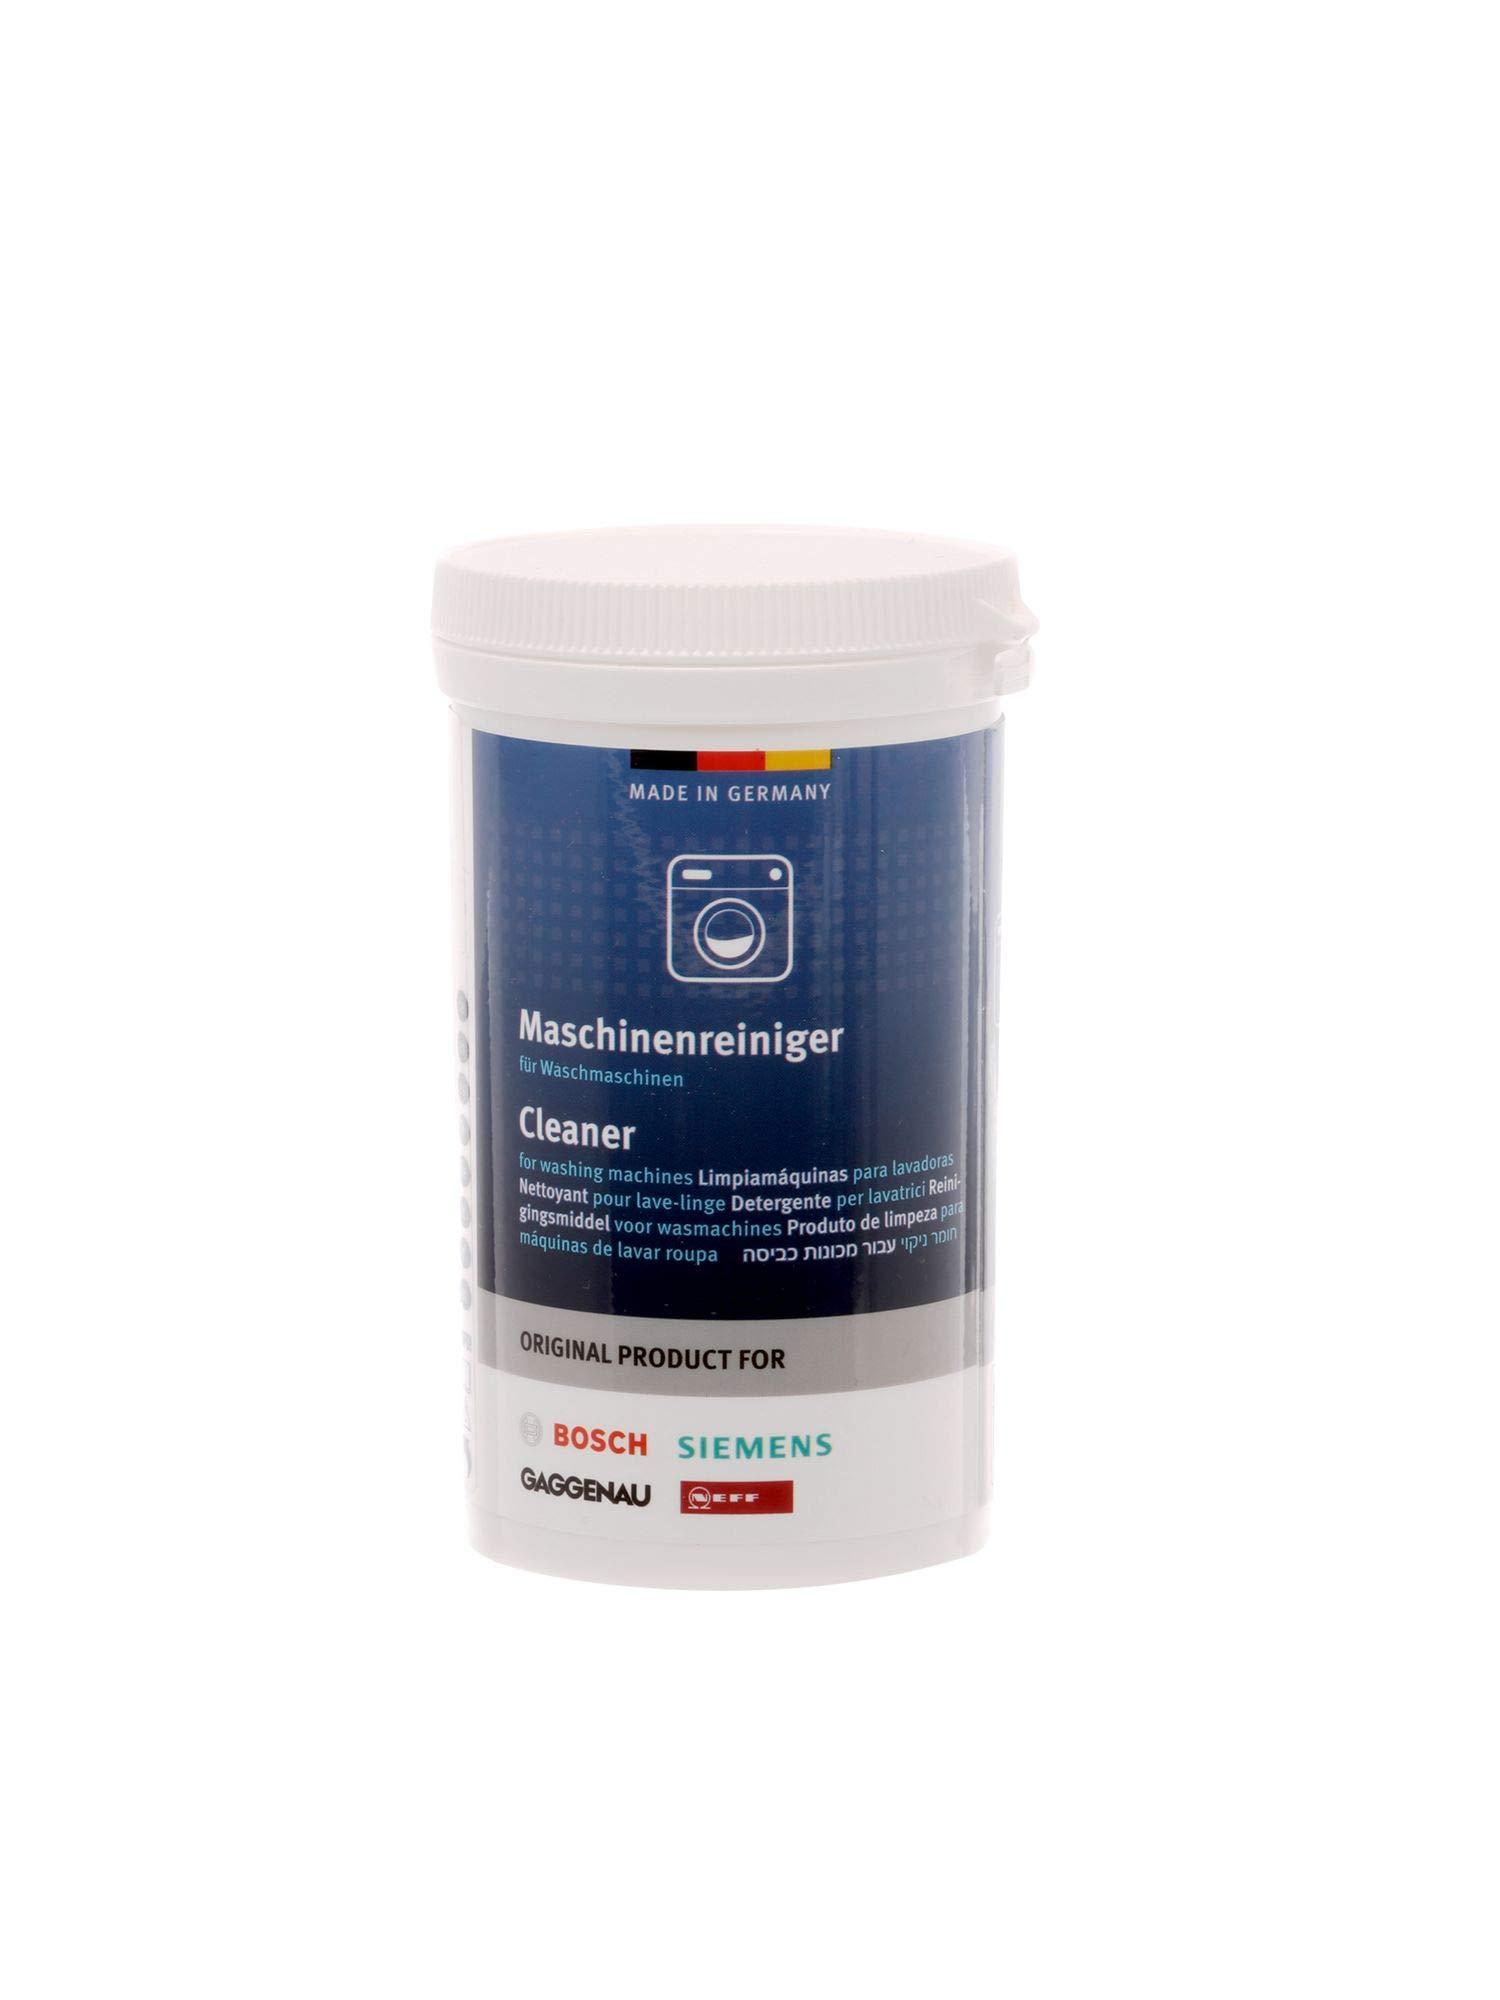 Bosch 00311925 Washing Machines Cleaner 2-Pack